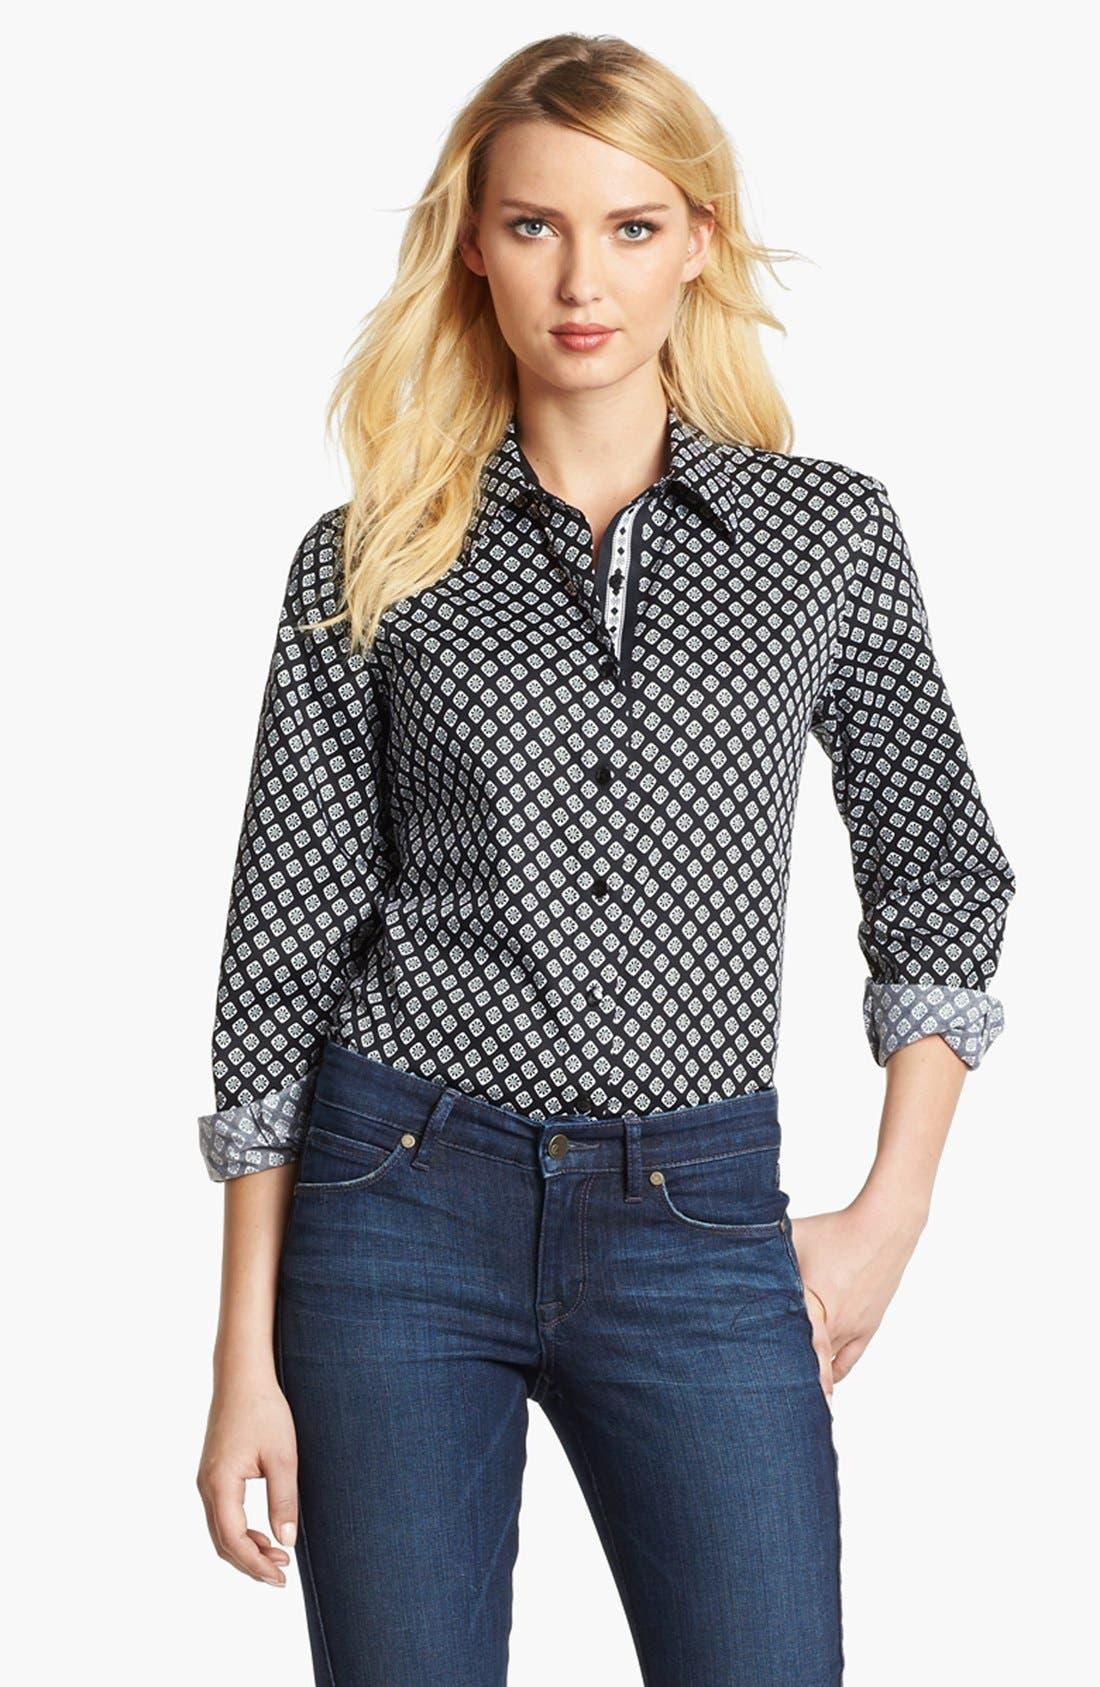 Alternate Image 1 Selected - Foxcroft Foulard Print Shirt